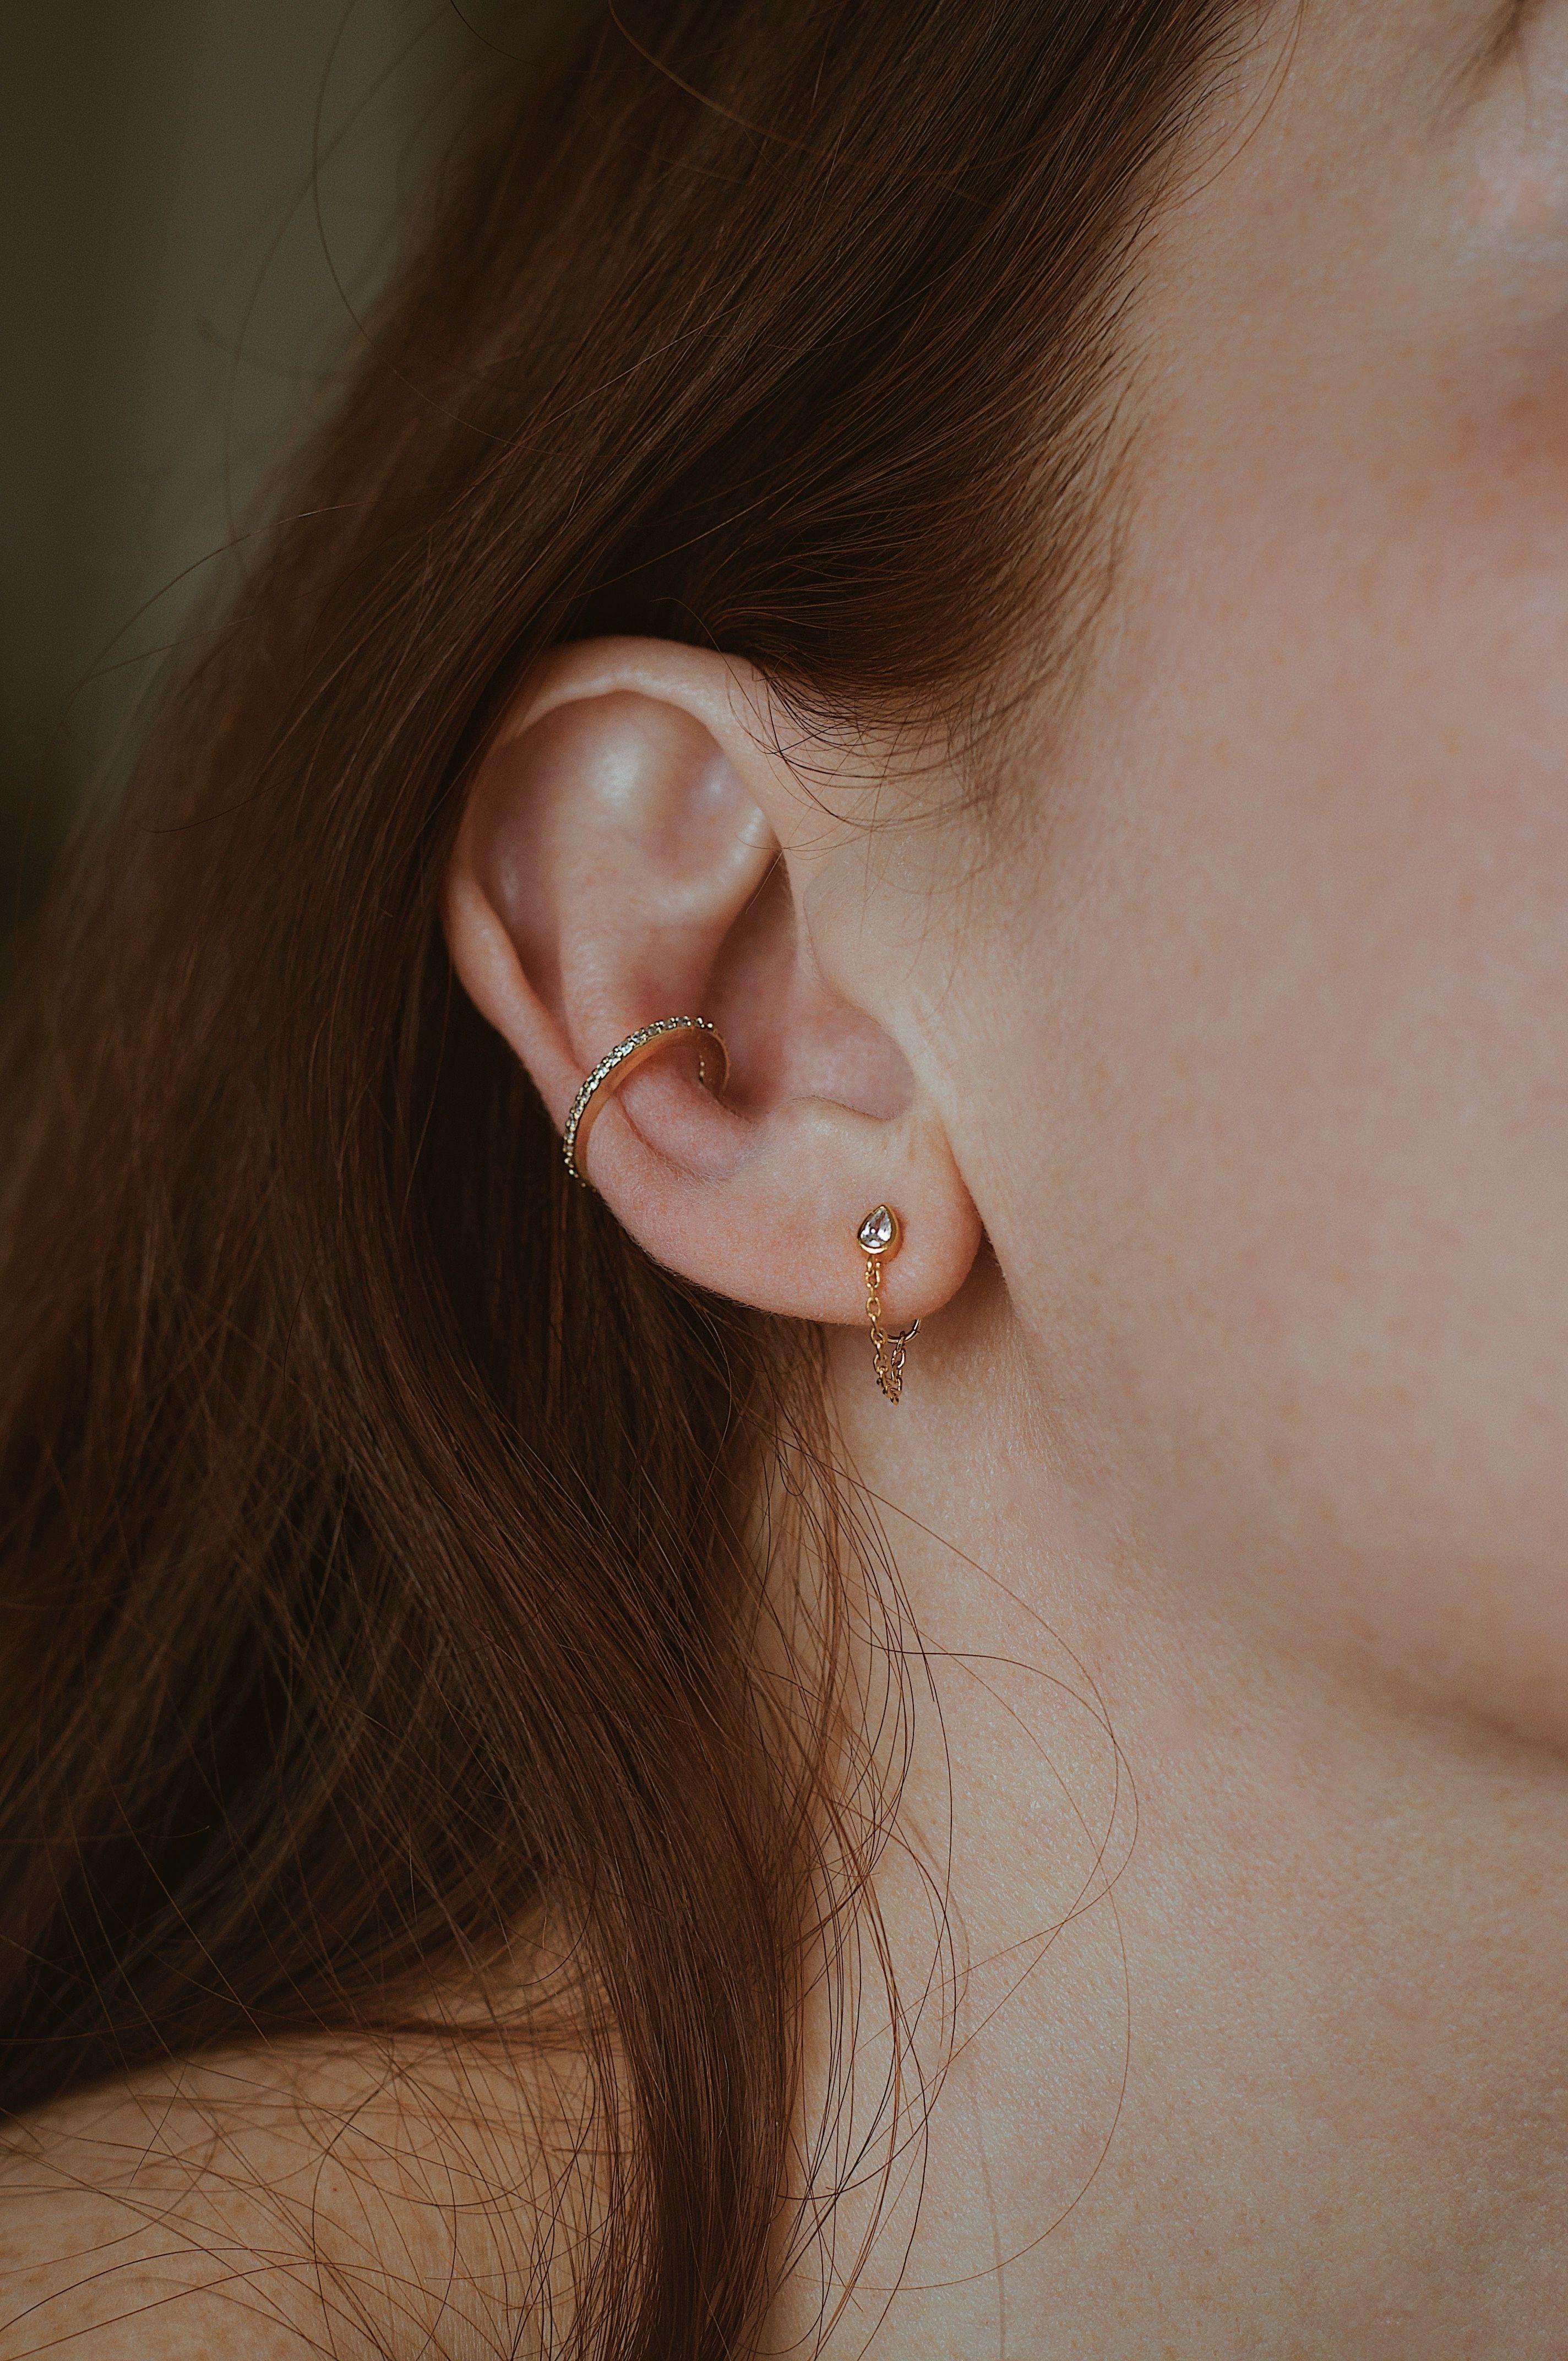 modern earrings geometric earrings GAUGES R\u00f6\u00f6tz- Simple brass earrings hammered earrings girlfriend gift for her,xmas gift Tribal